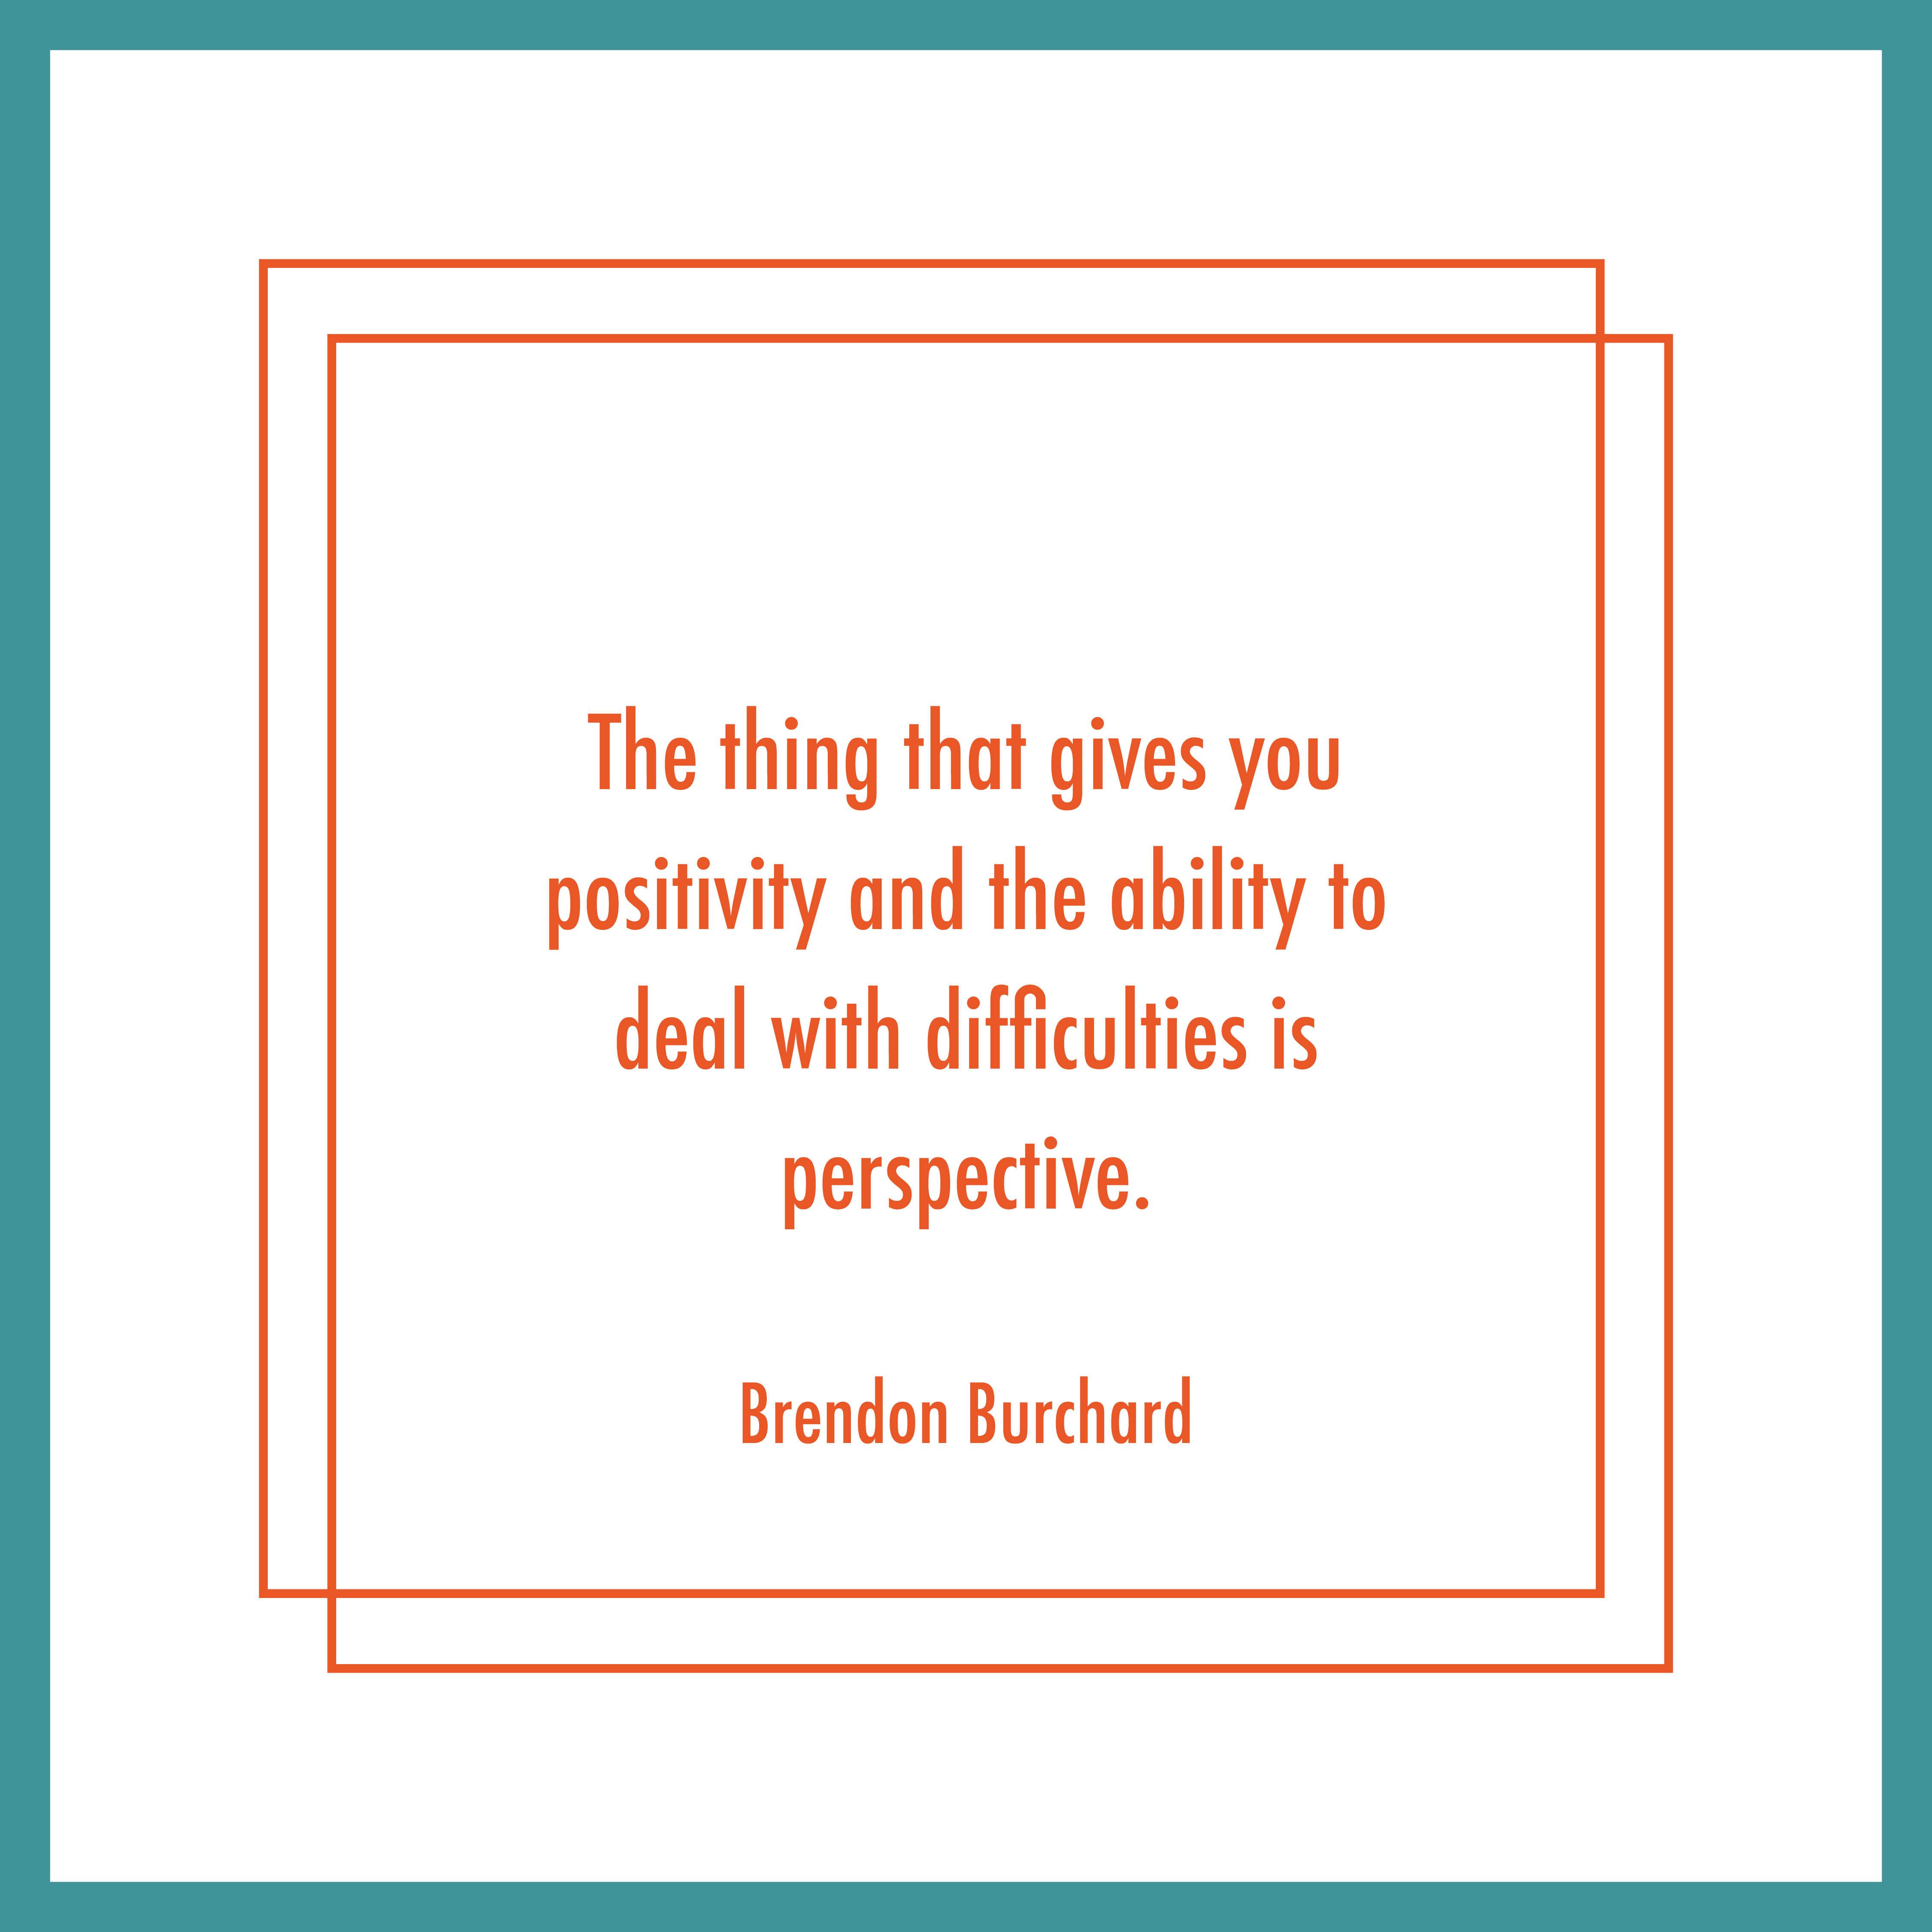 TBS-EP41-Perspective-BrendonBurchardQuotes